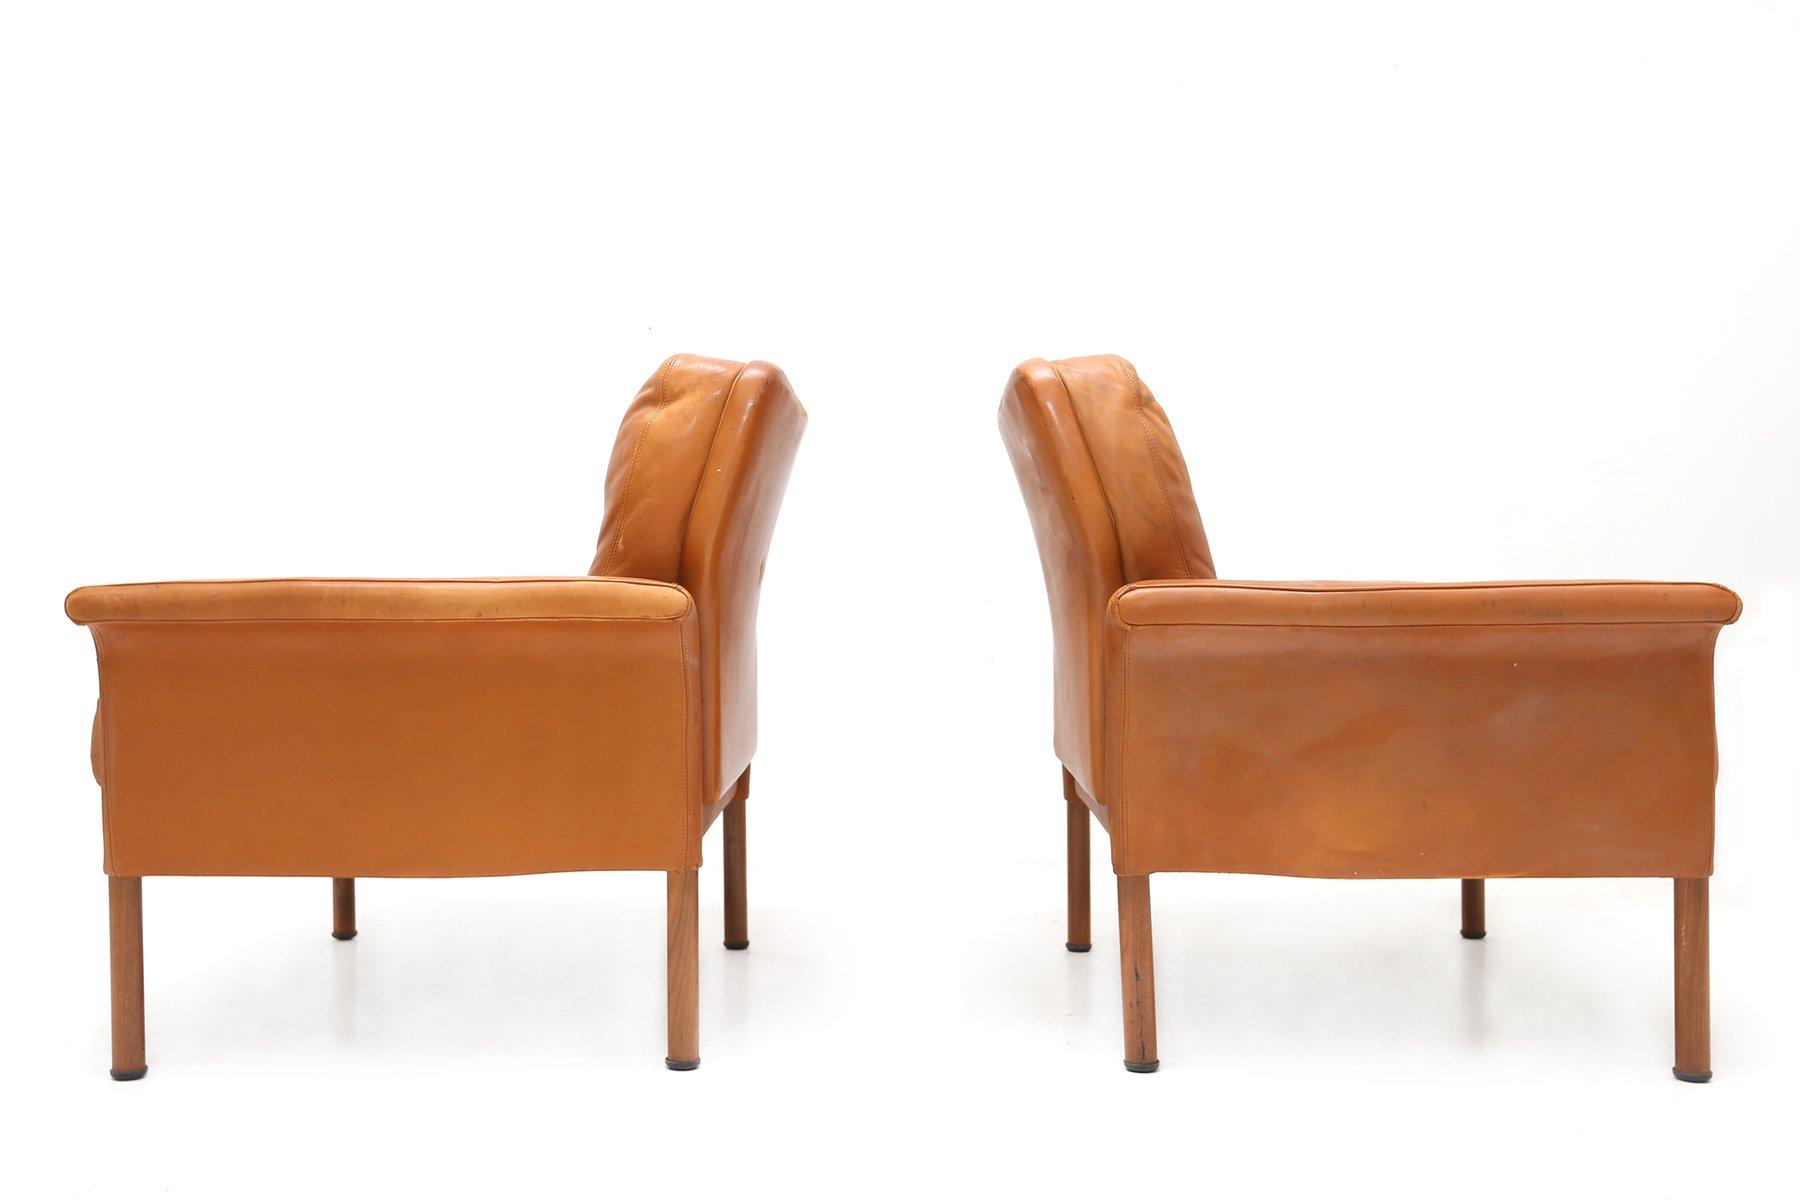 cognac ledersessel von wittmann 1960er 2er set bei pamono kaufen. Black Bedroom Furniture Sets. Home Design Ideas